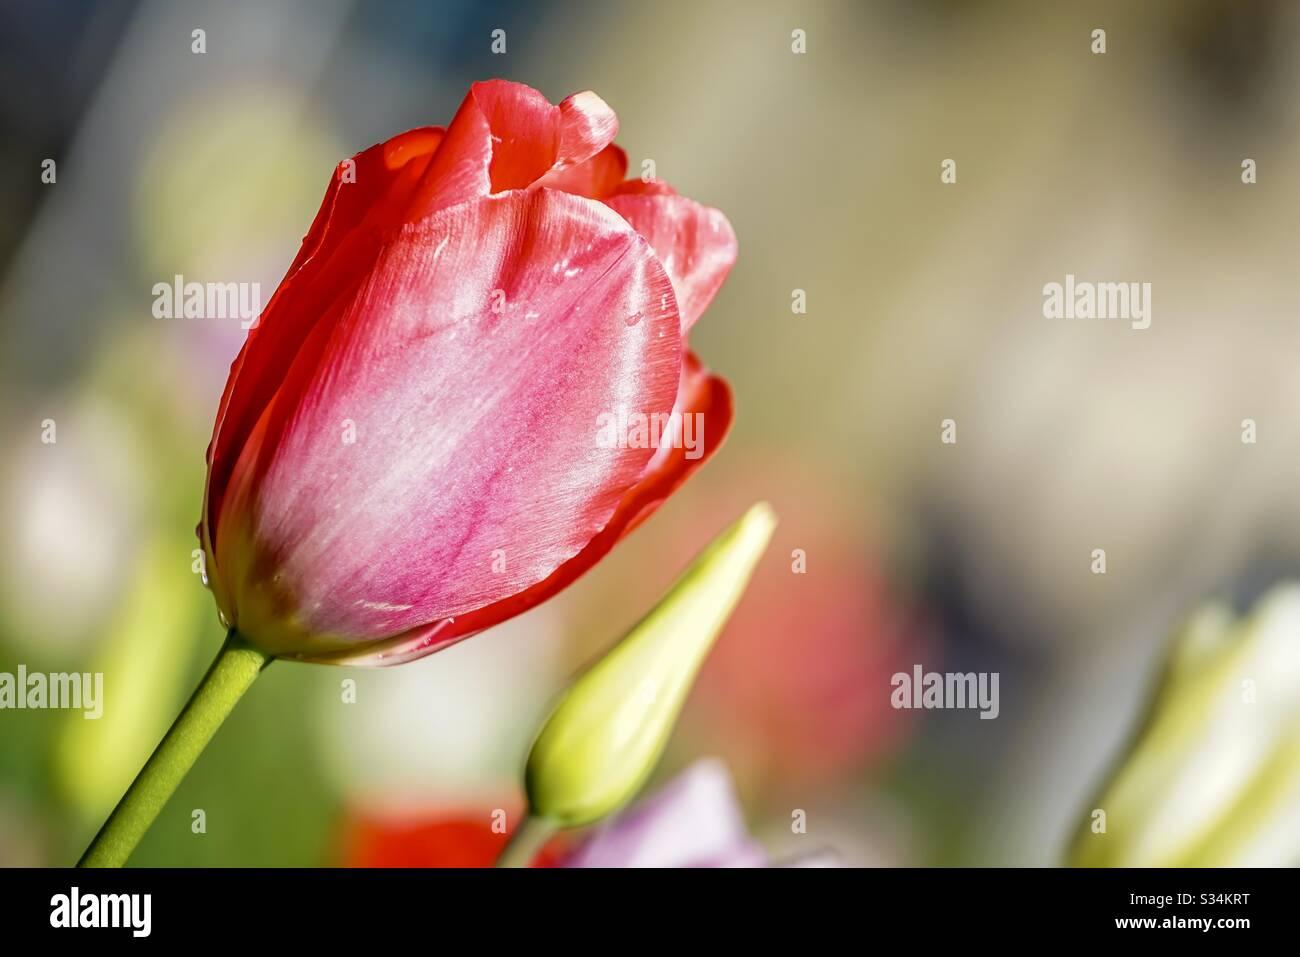 Tulipán rojo con gotas de agua Foto de stock